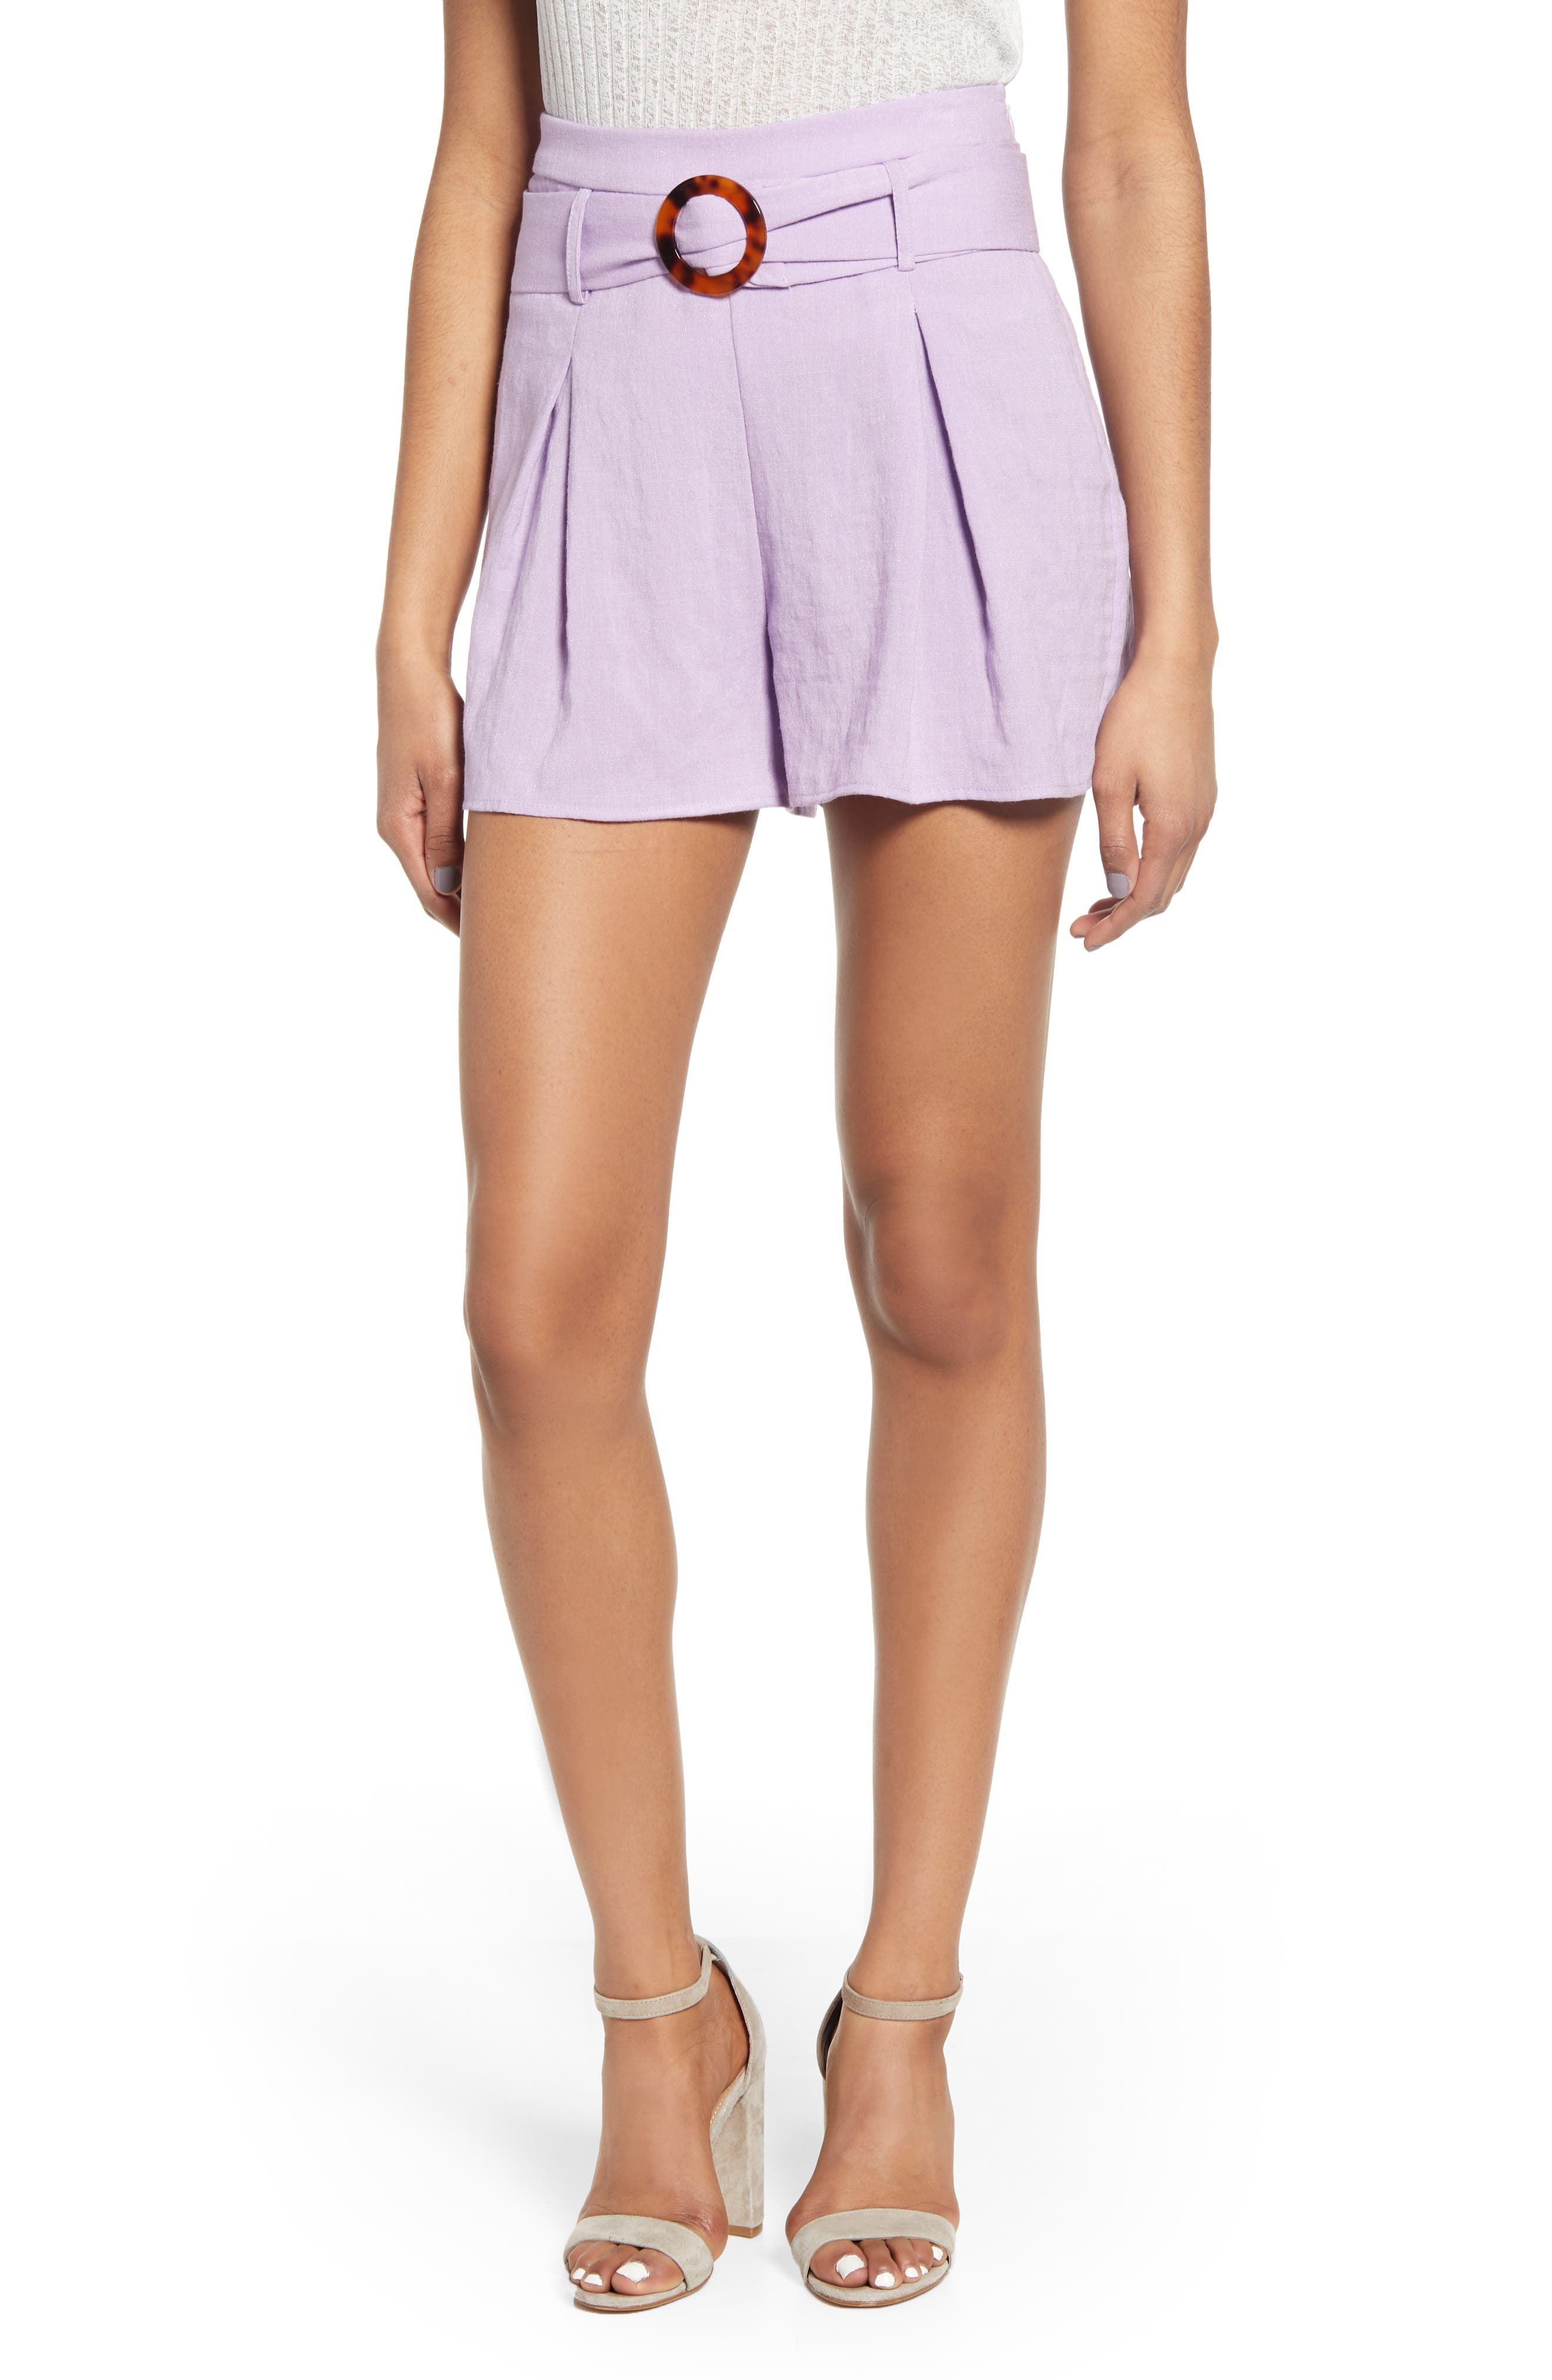 Vintage High Waisted Shorts, Sailor Shorts, Retro Shorts Womens J.o.a. Belted Flare Shorts $75.00 AT vintagedancer.com